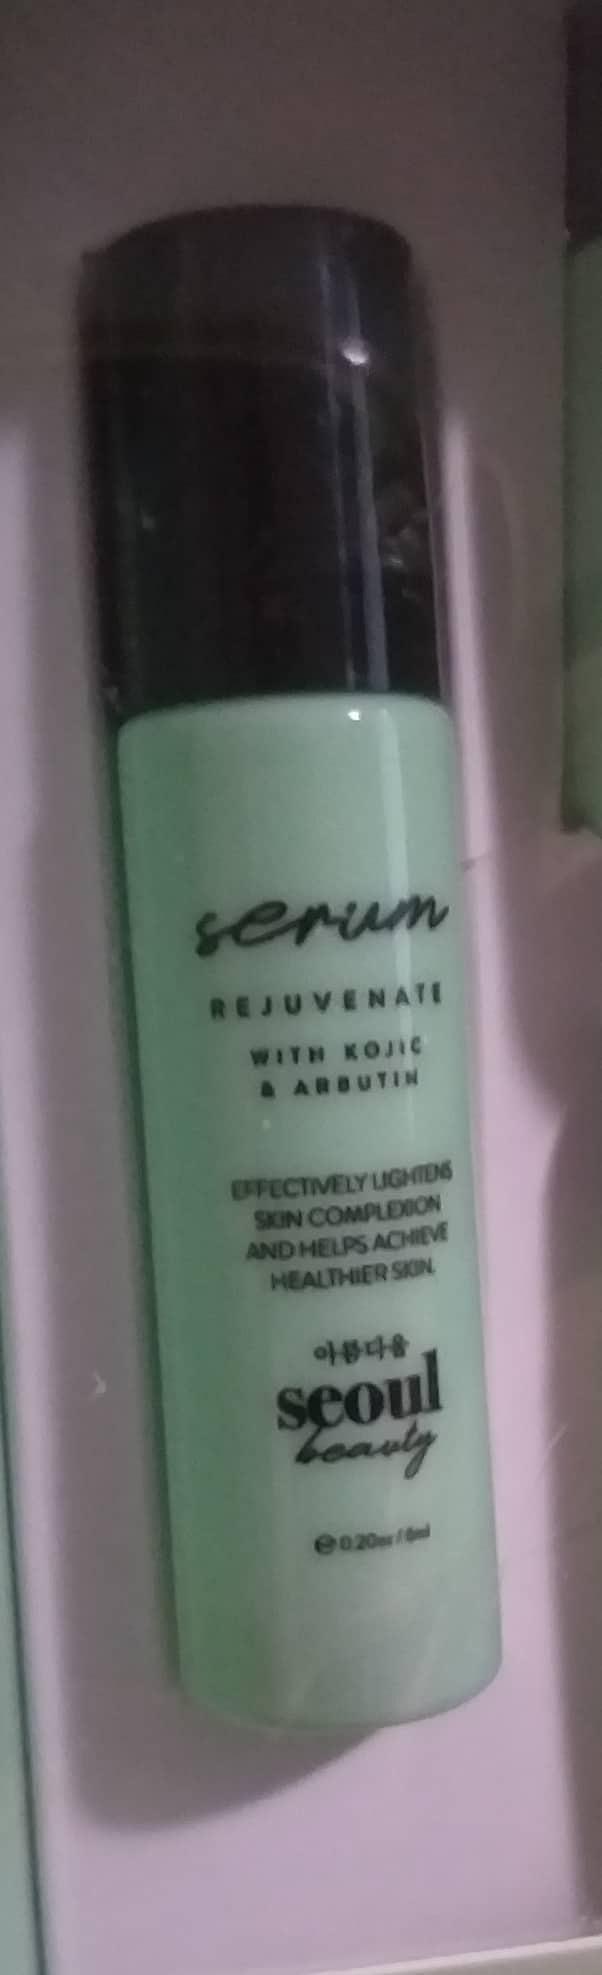 Seoul Beauty Rejuvenating Serum